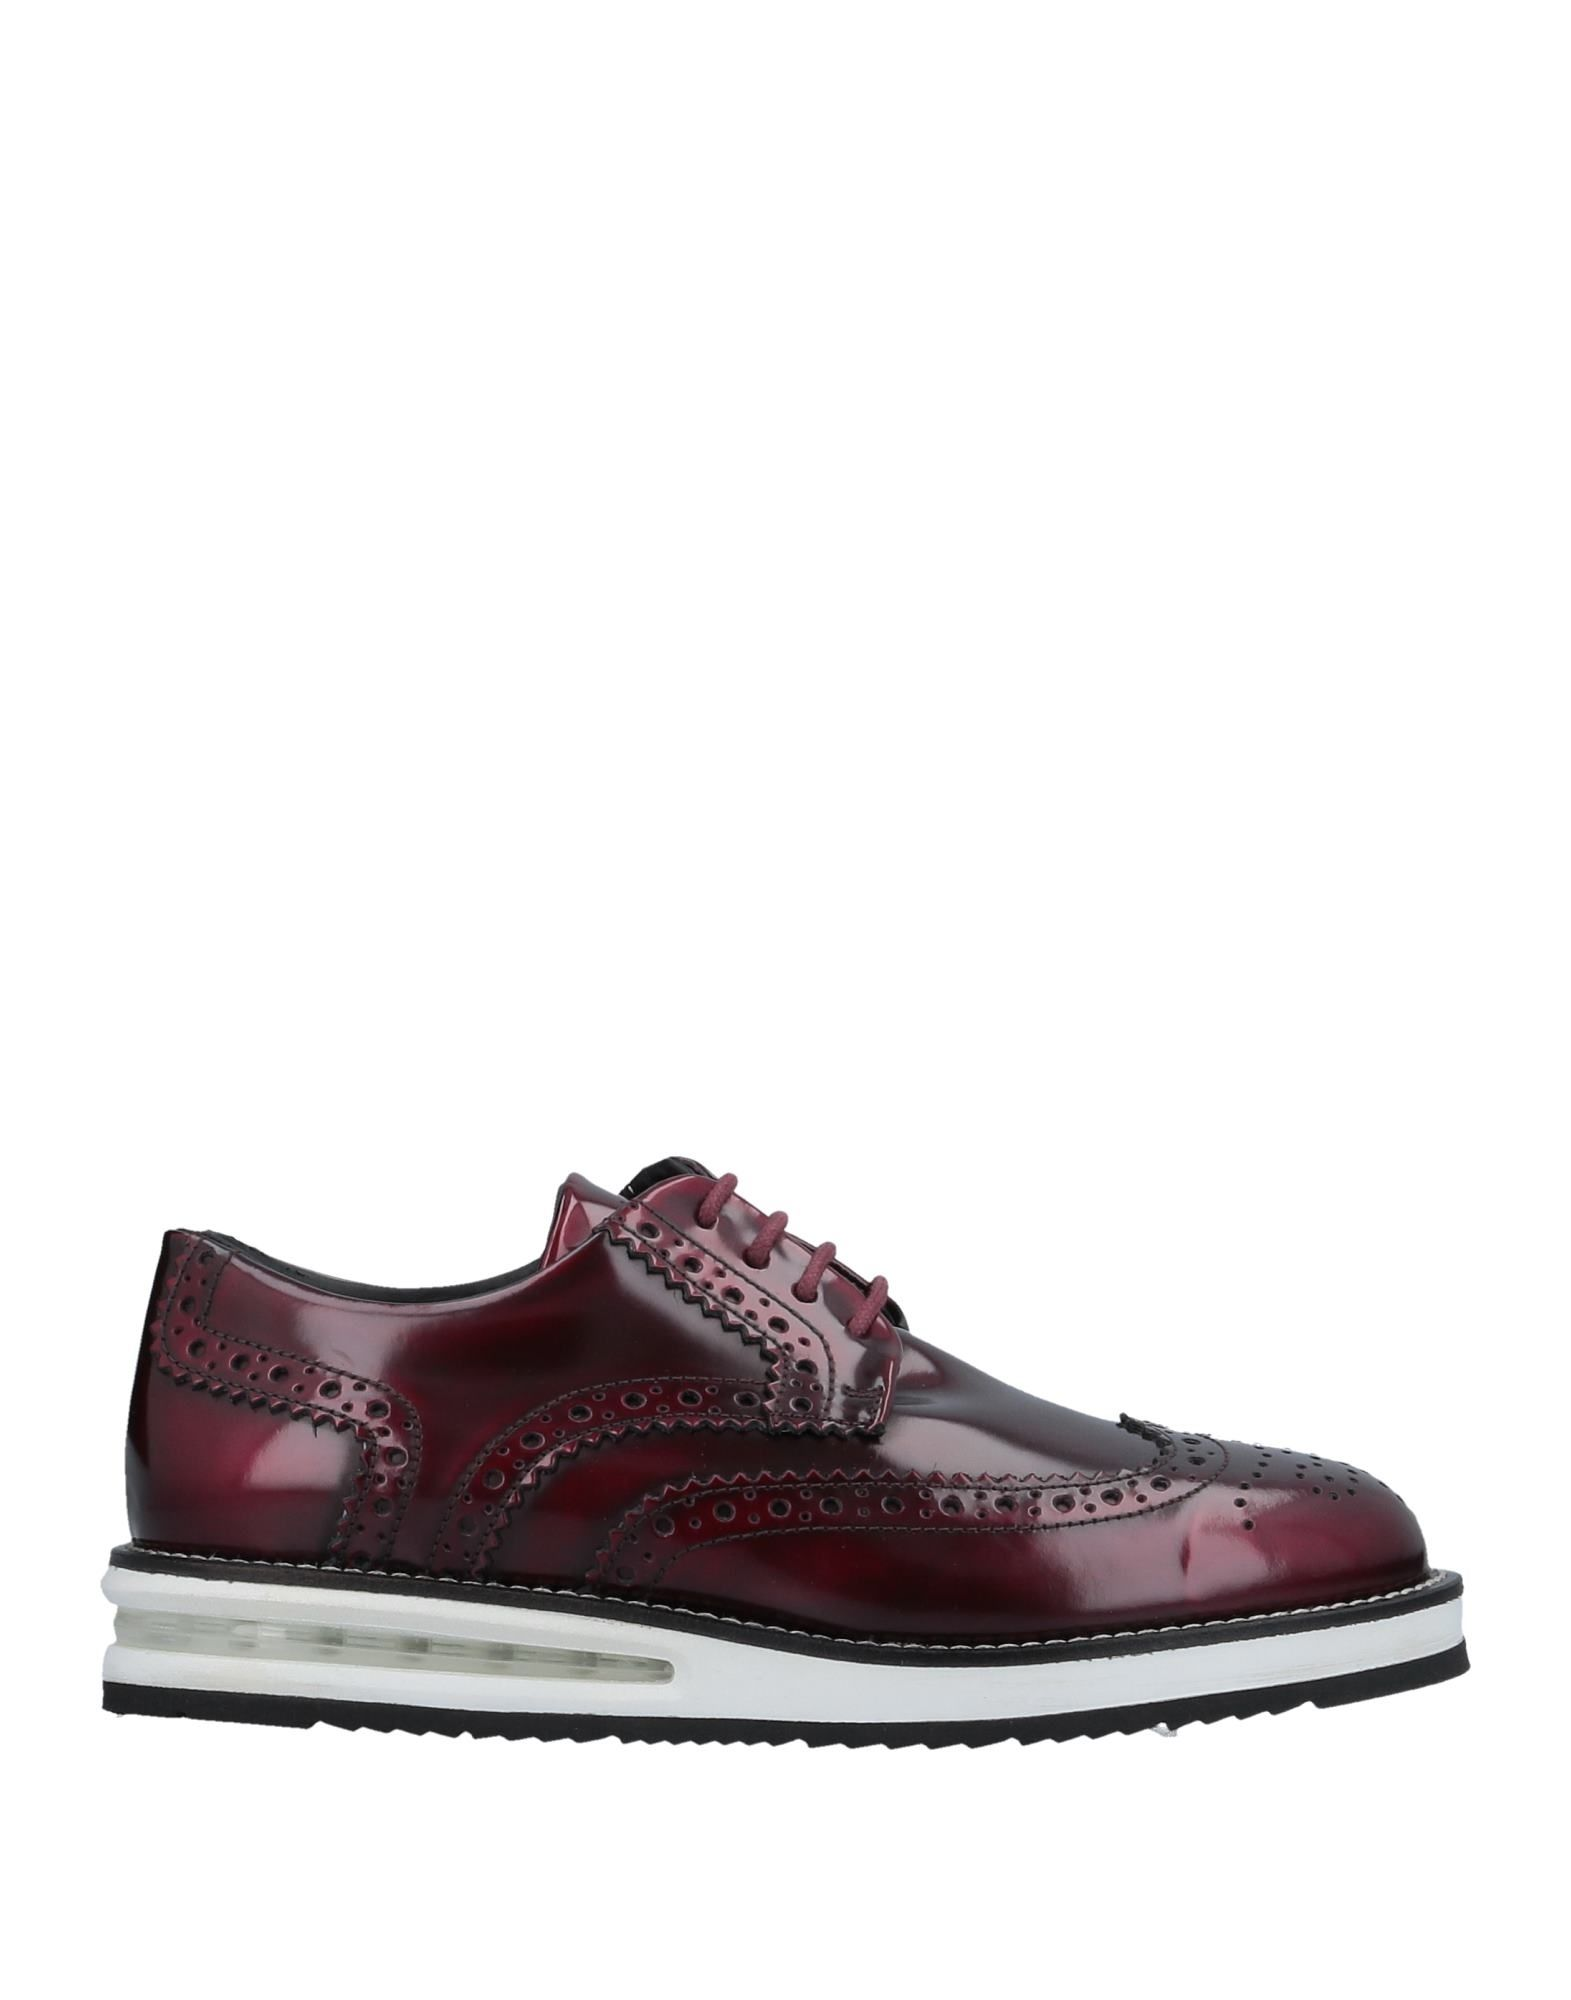 Barleycorn Schnürschuhe Damen  11505335PP Heiße Schuhe Schuhe Schuhe d5e617